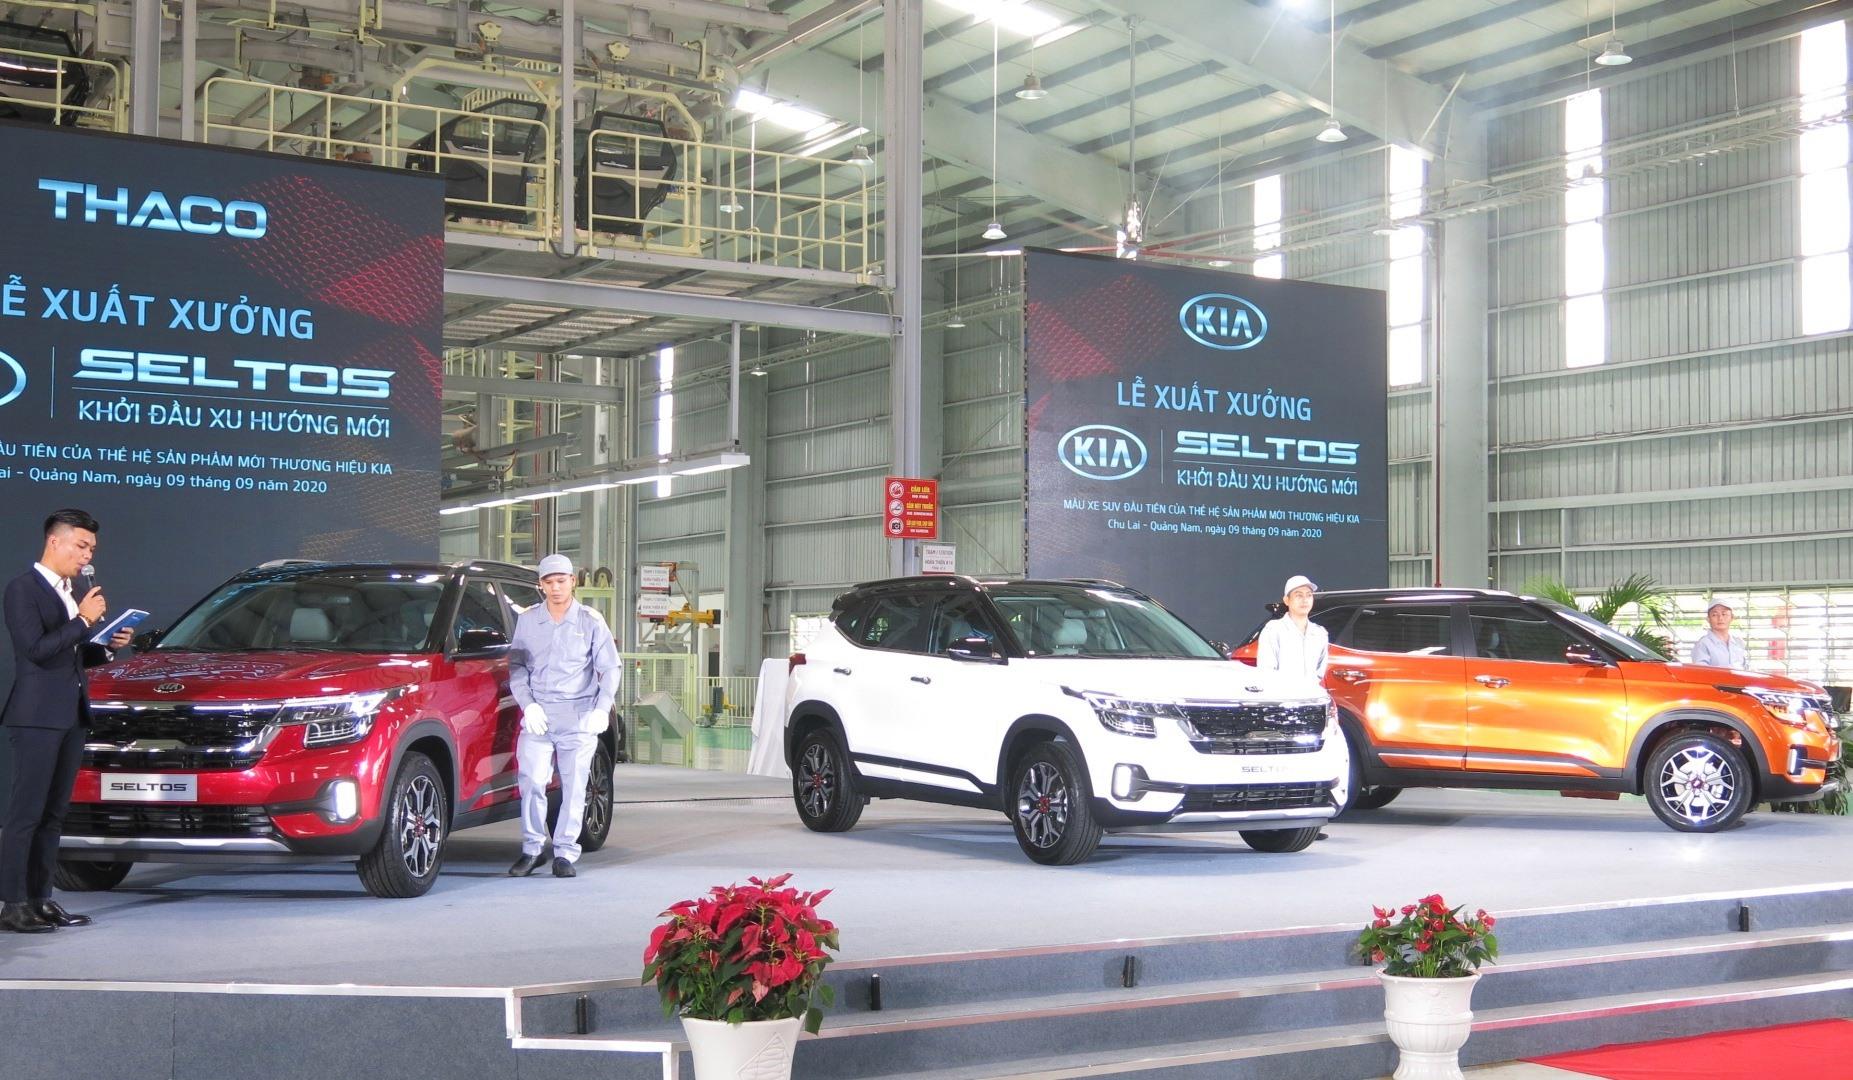 Kia Seltos với 3 phiên bản: Deluxe, Luxury, Premium